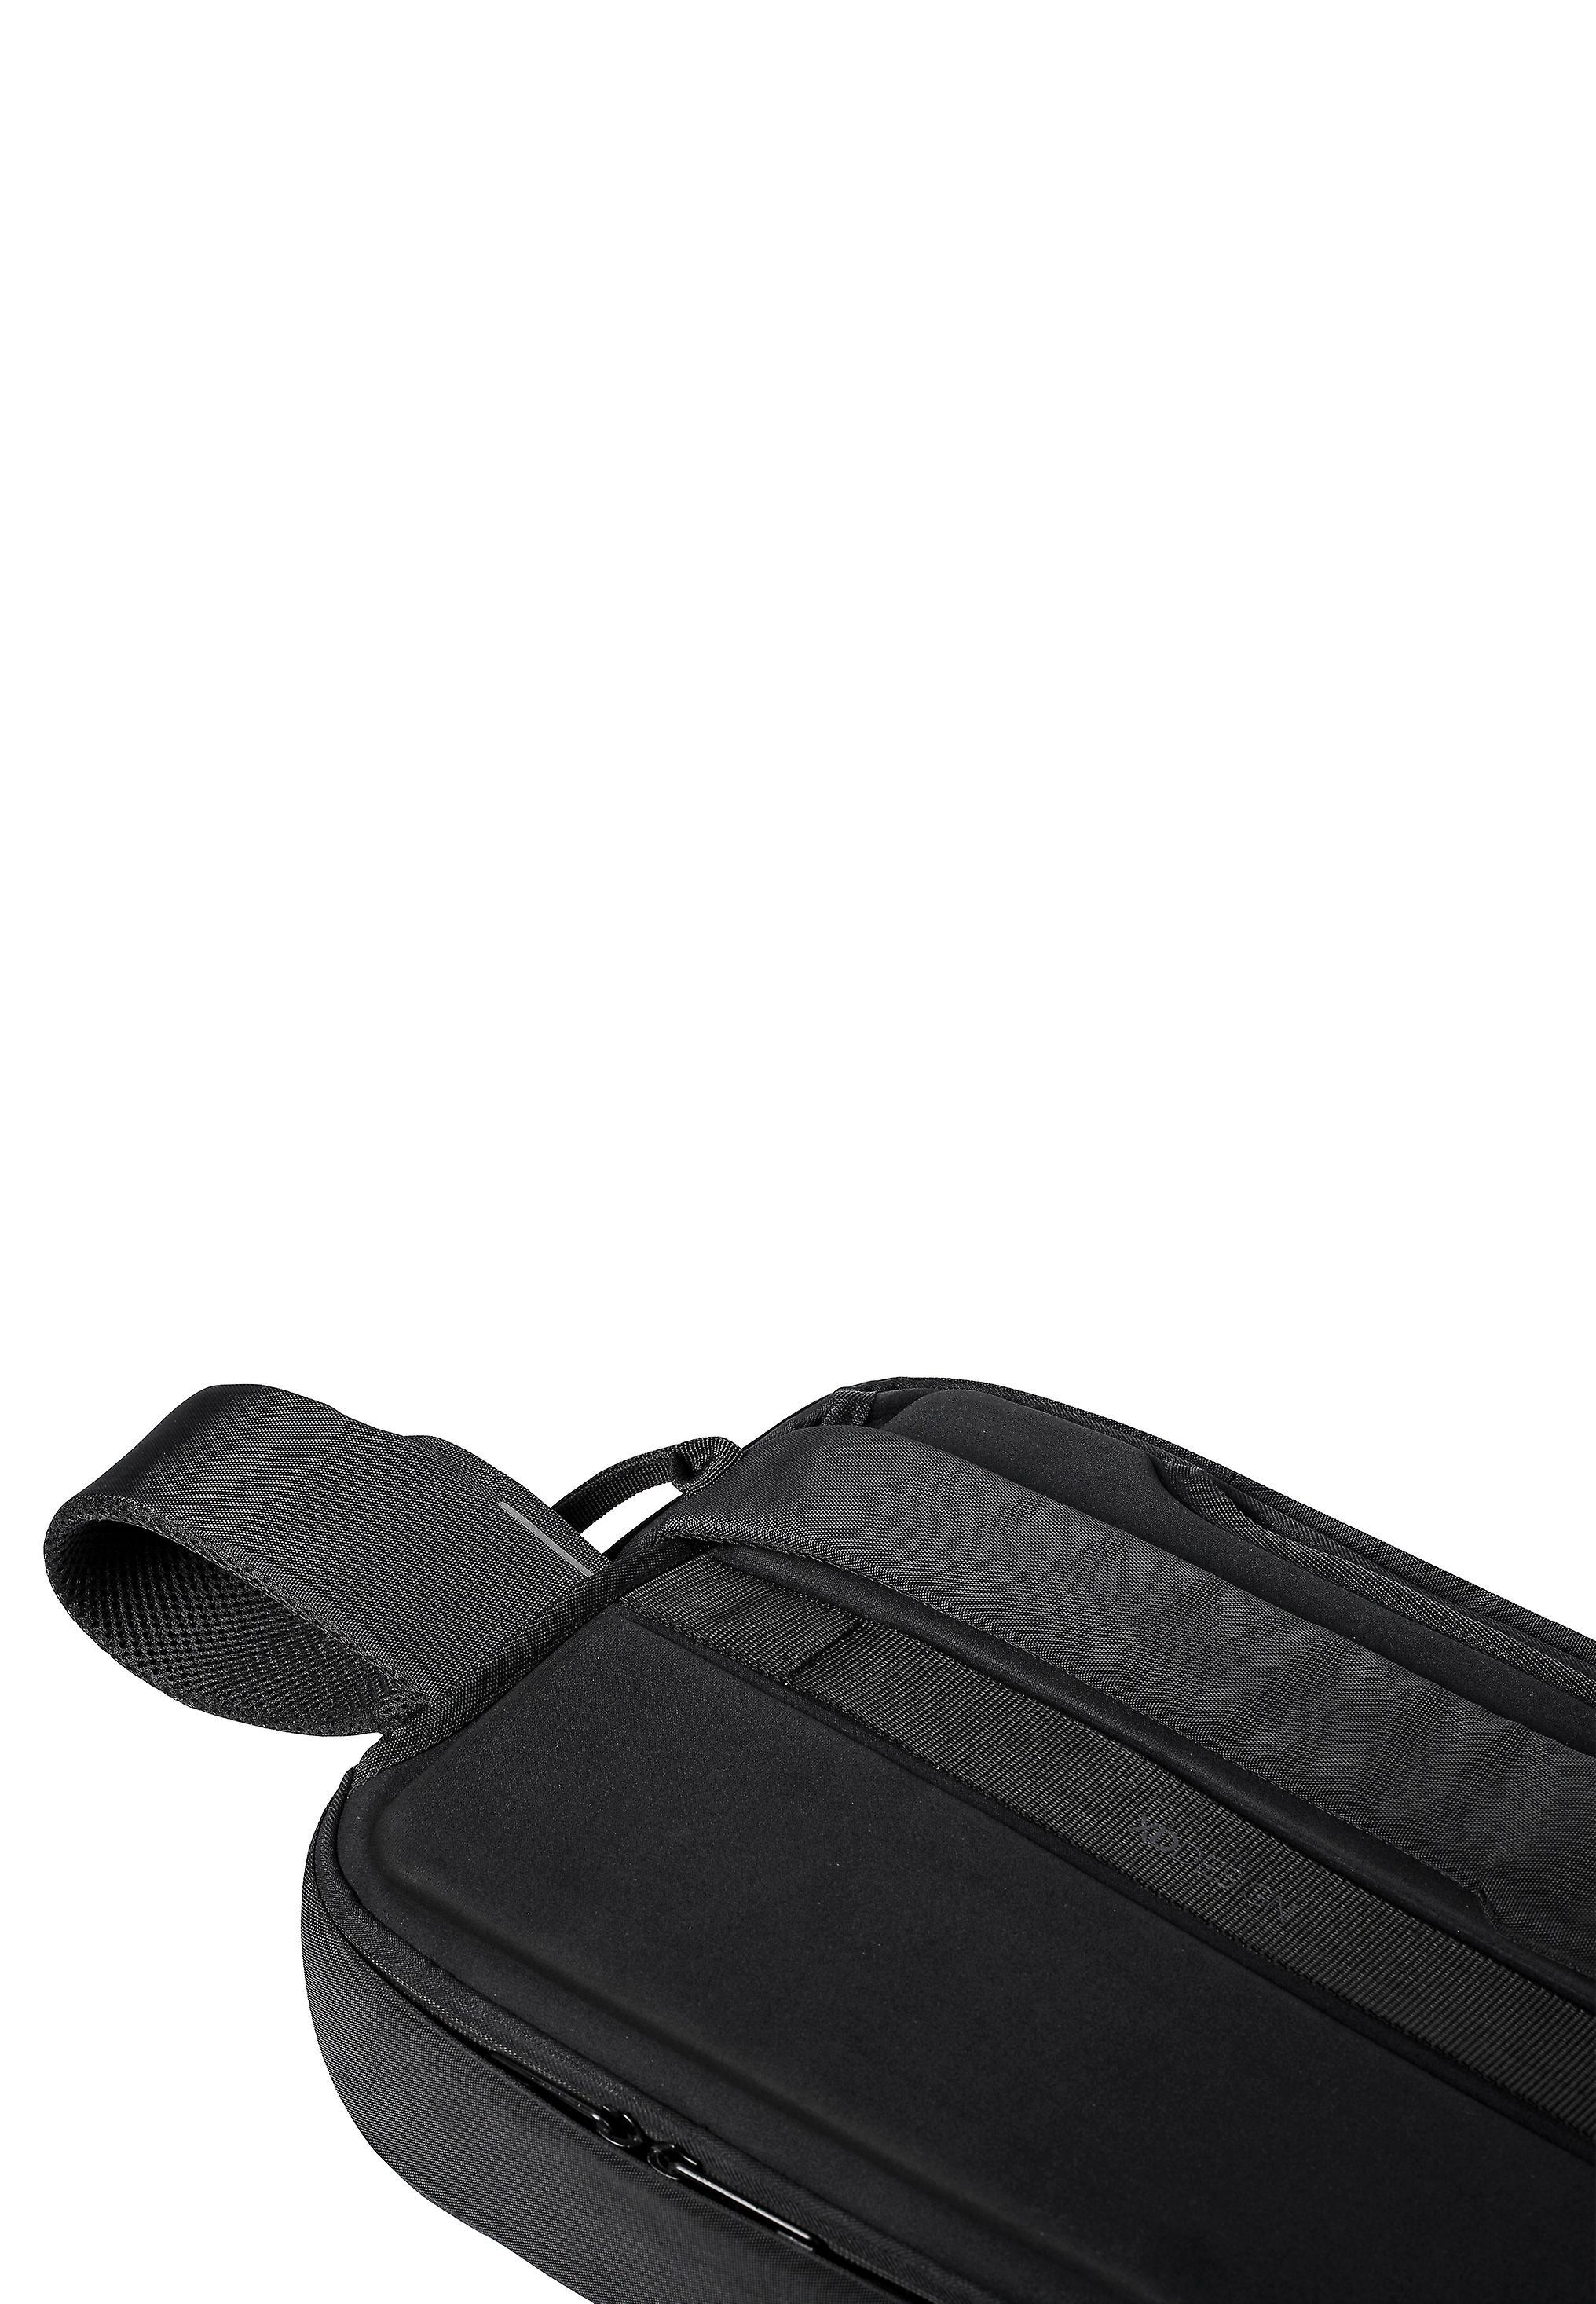 XD Design Bobby Bizz Anti-Theft Laptop Backpack & Briefcase USB (Unisex)